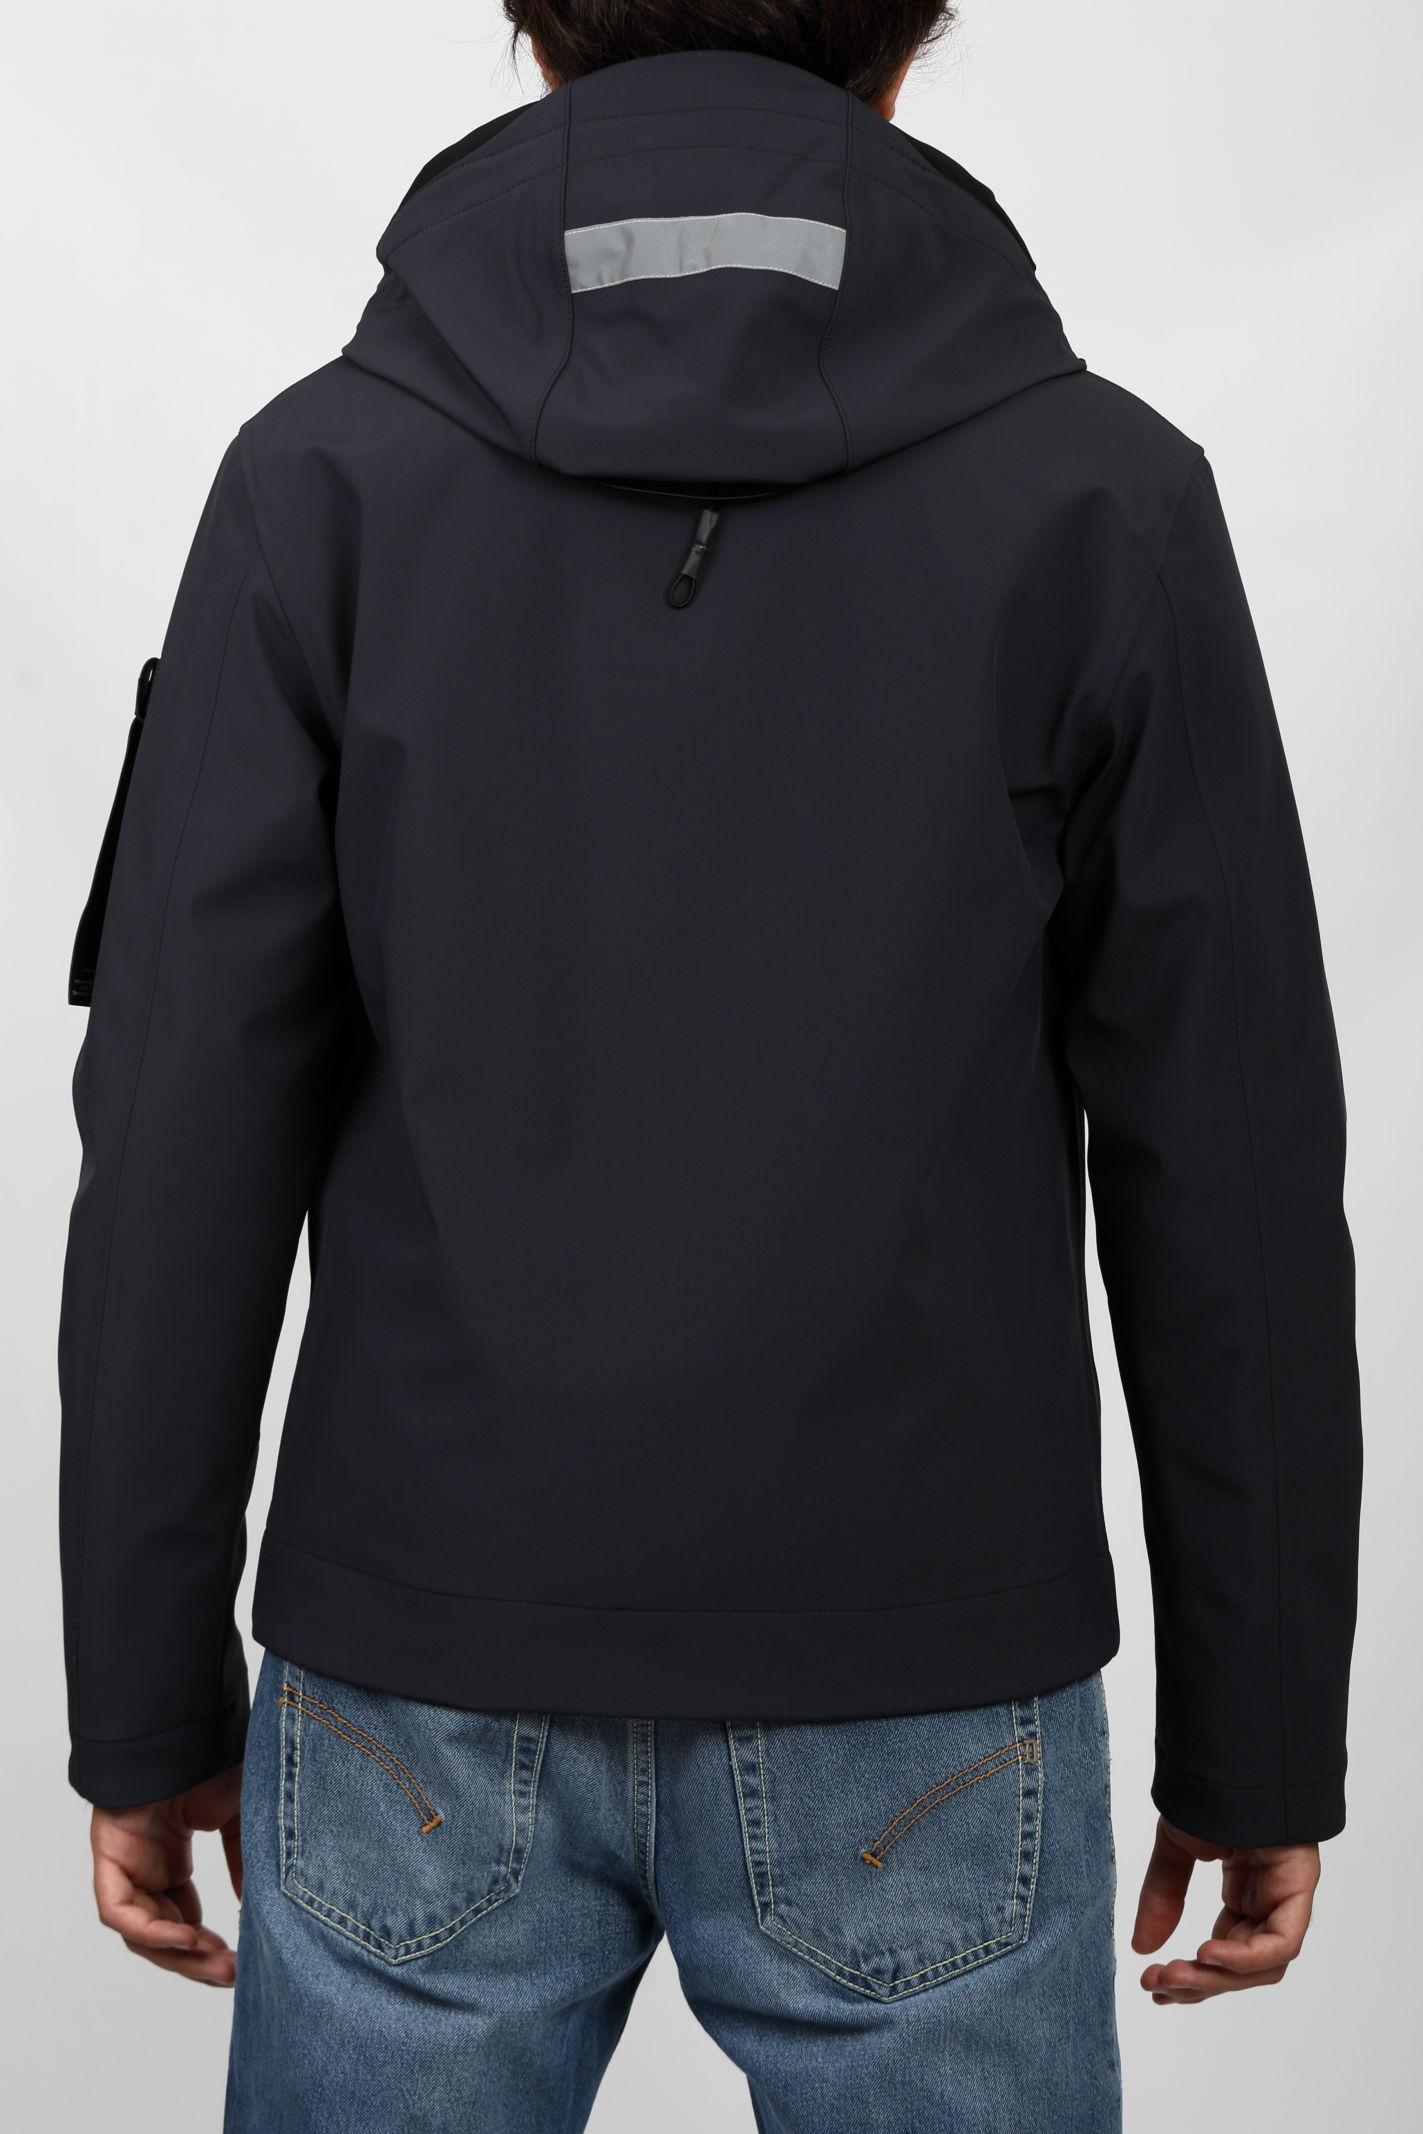 HESTON KP PEUTEREY   Outerwear   PEU3311215